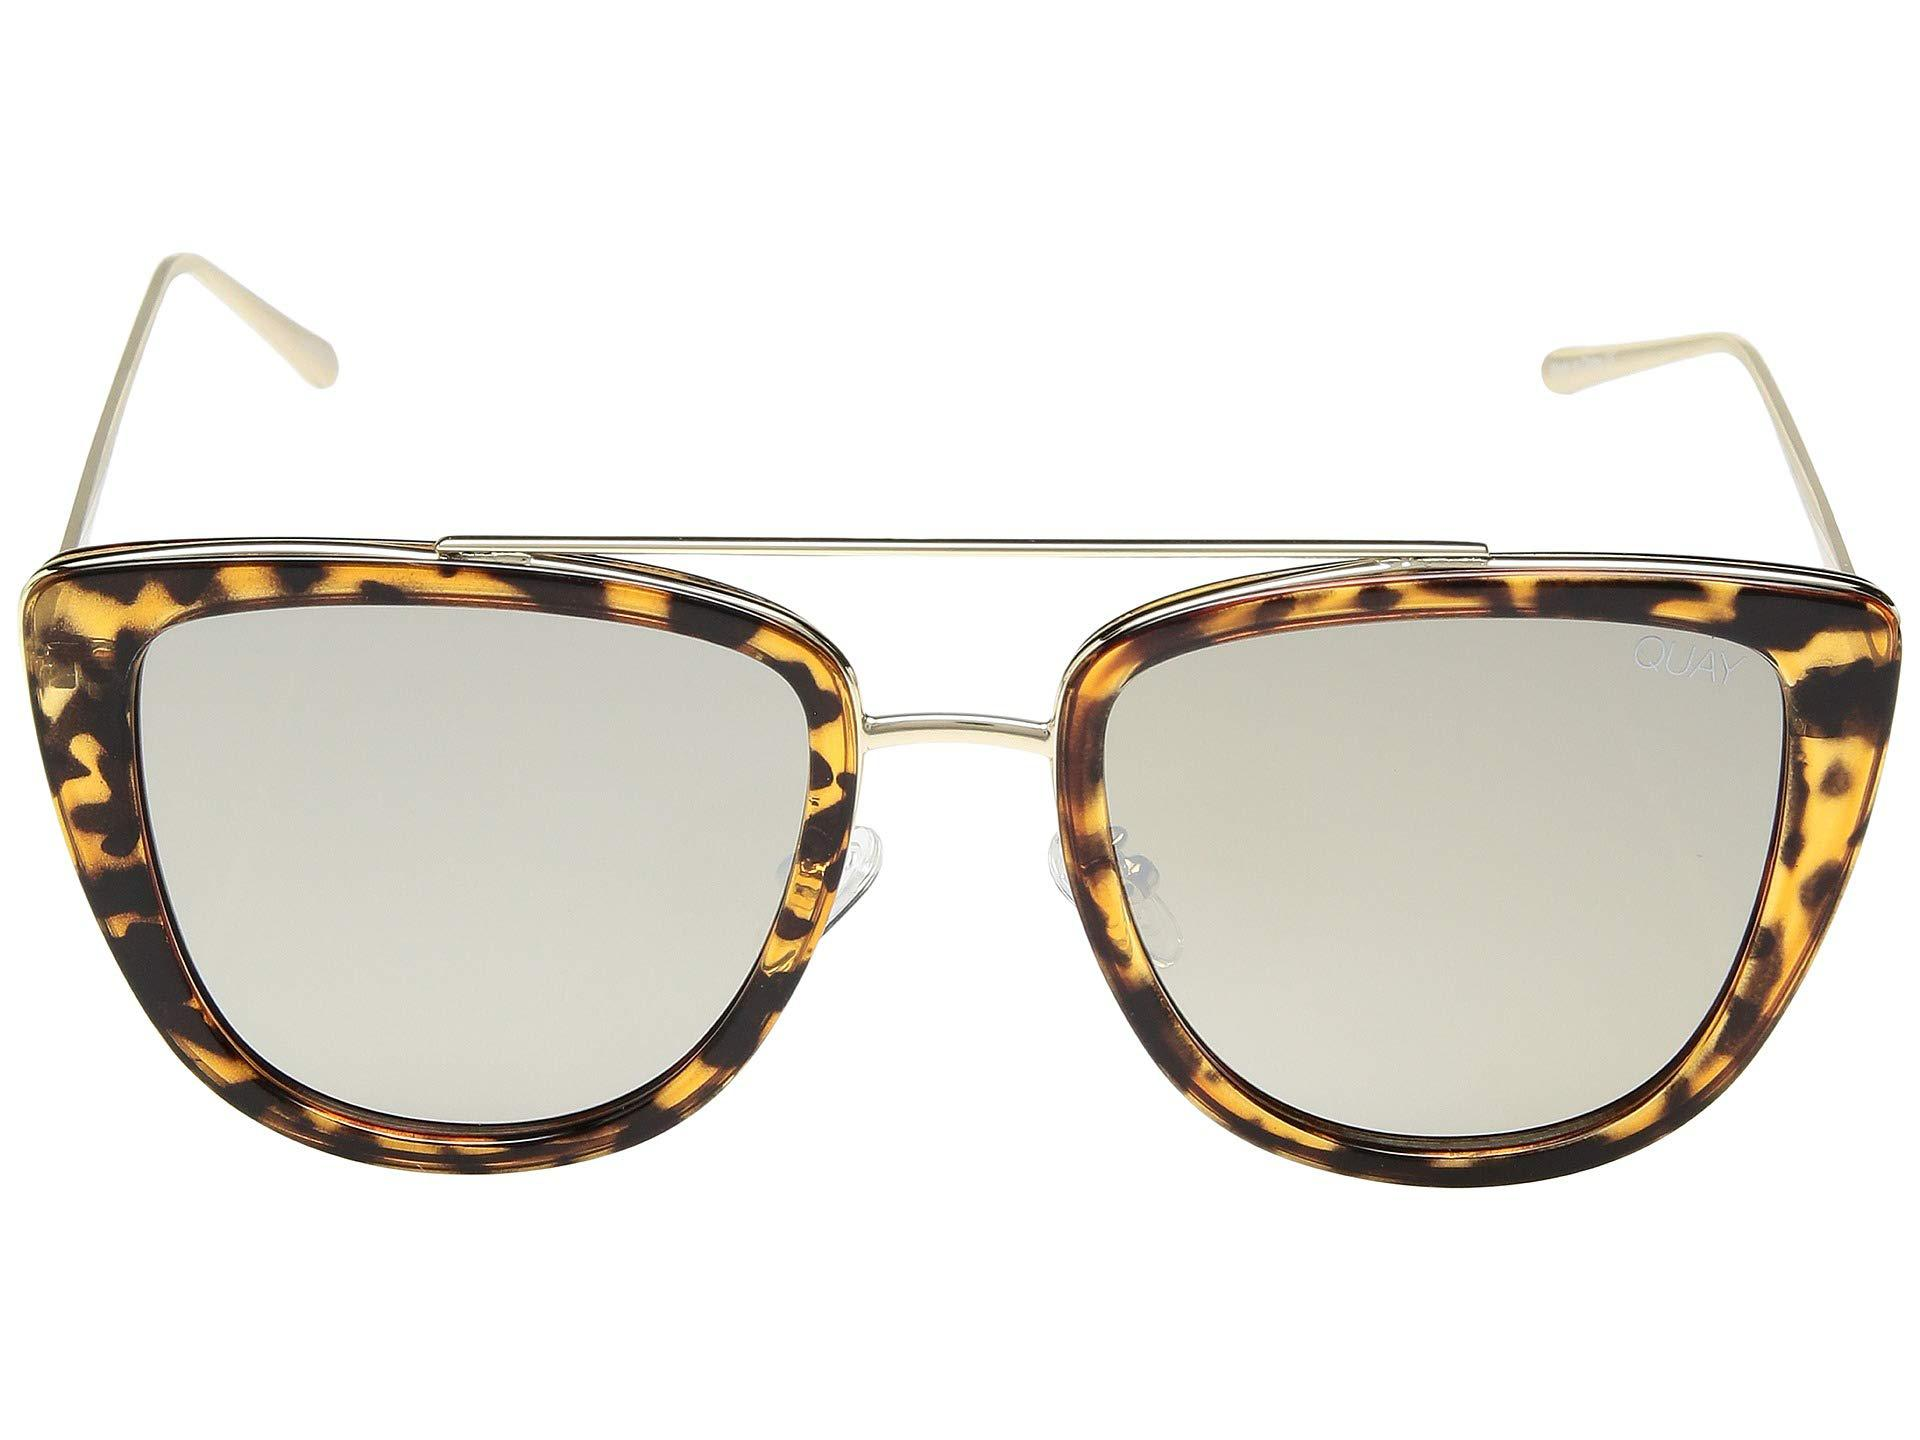 2df979f2dfea3 Quay - Metallic French Kiss (clear rose) Fashion Sunglasses - Lyst. View  fullscreen